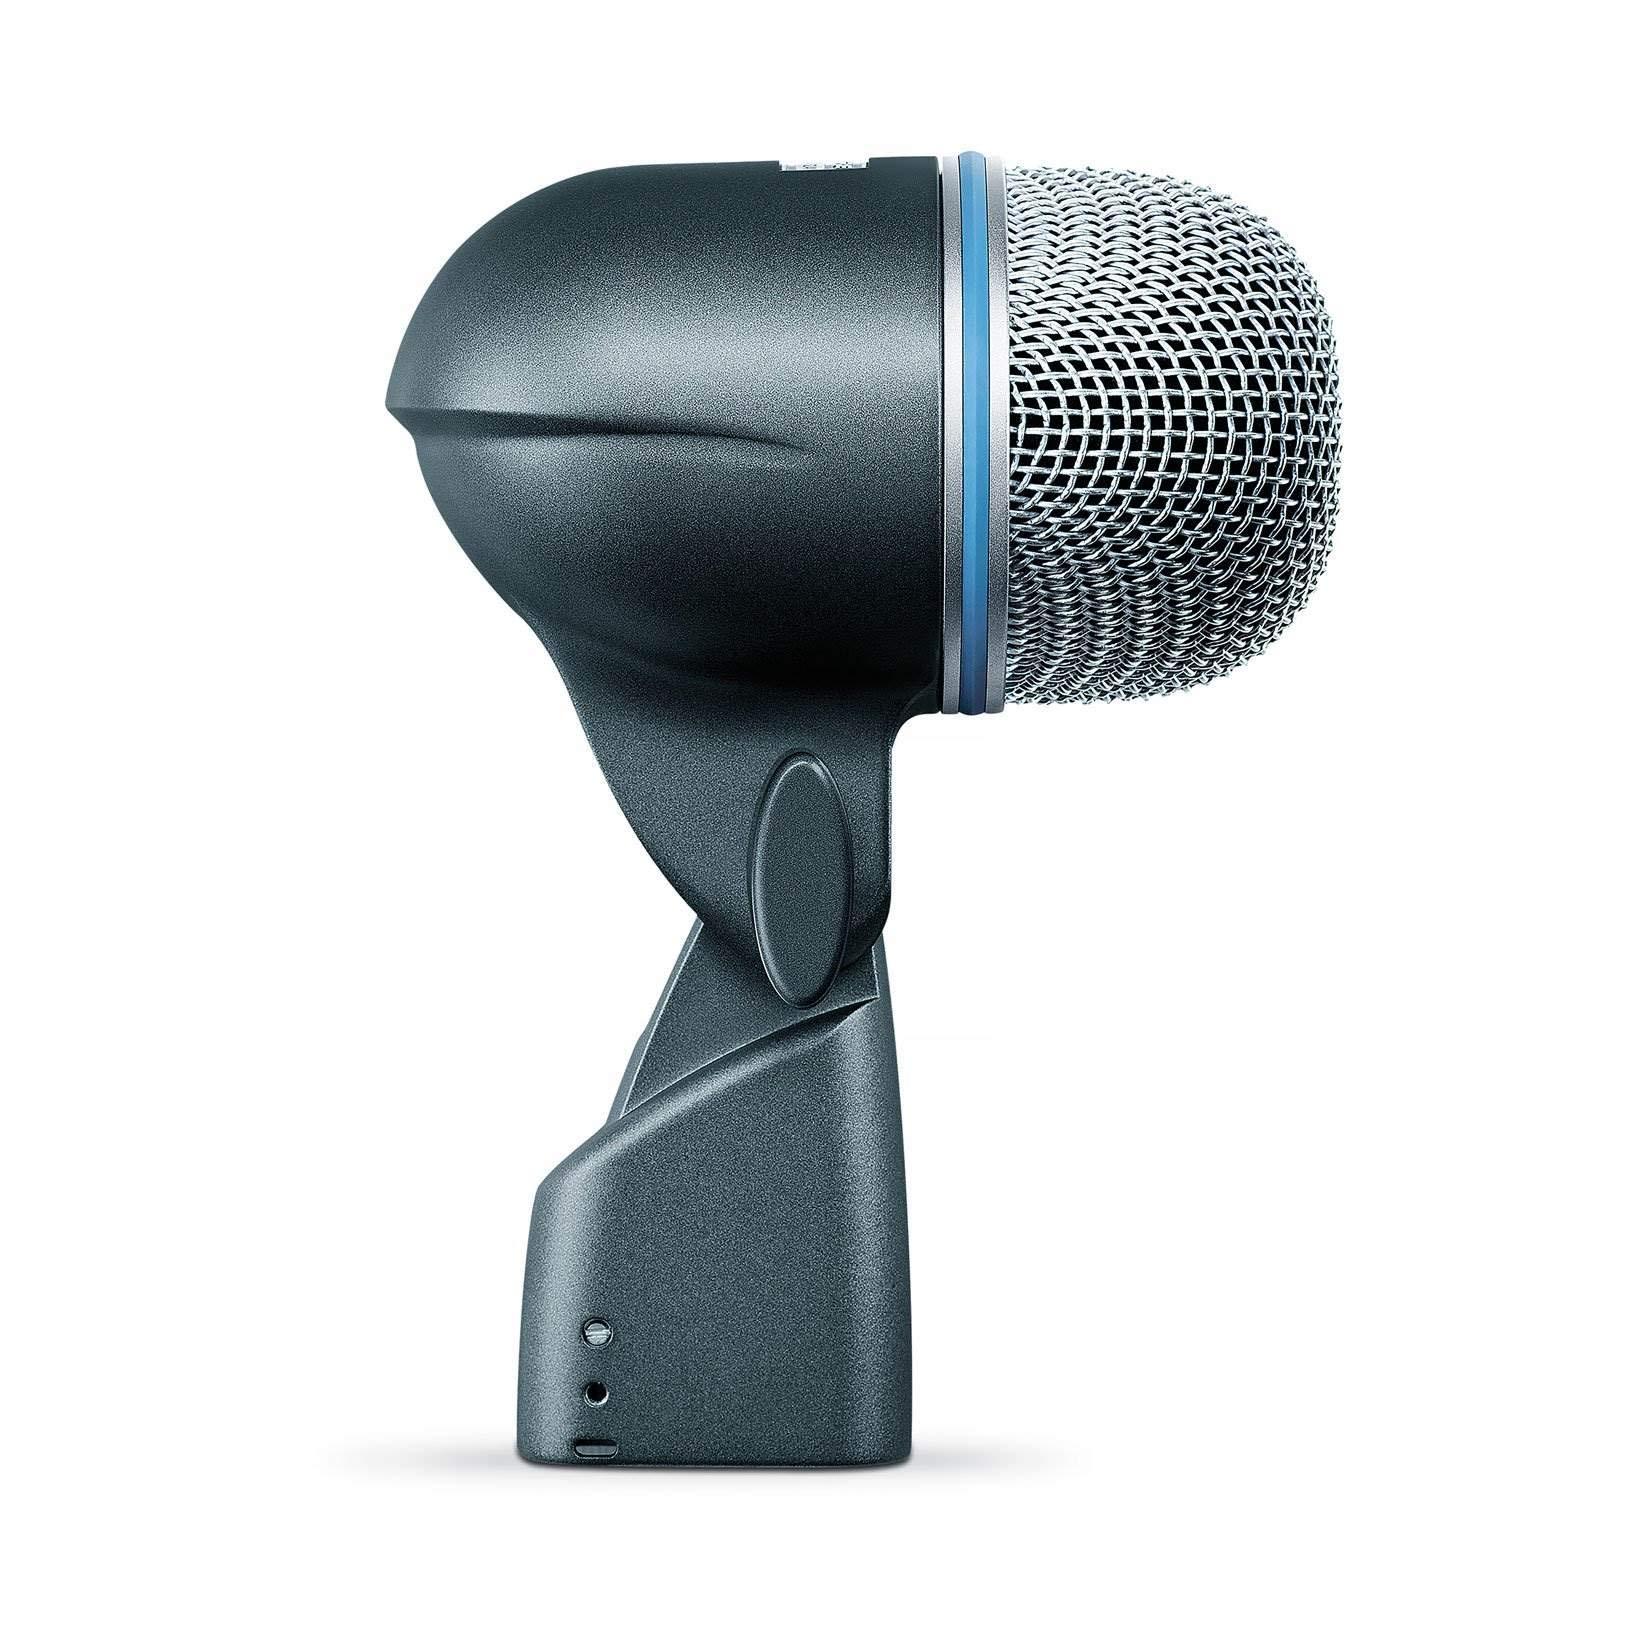 Shure BETA 52A Supercardioid Microphone